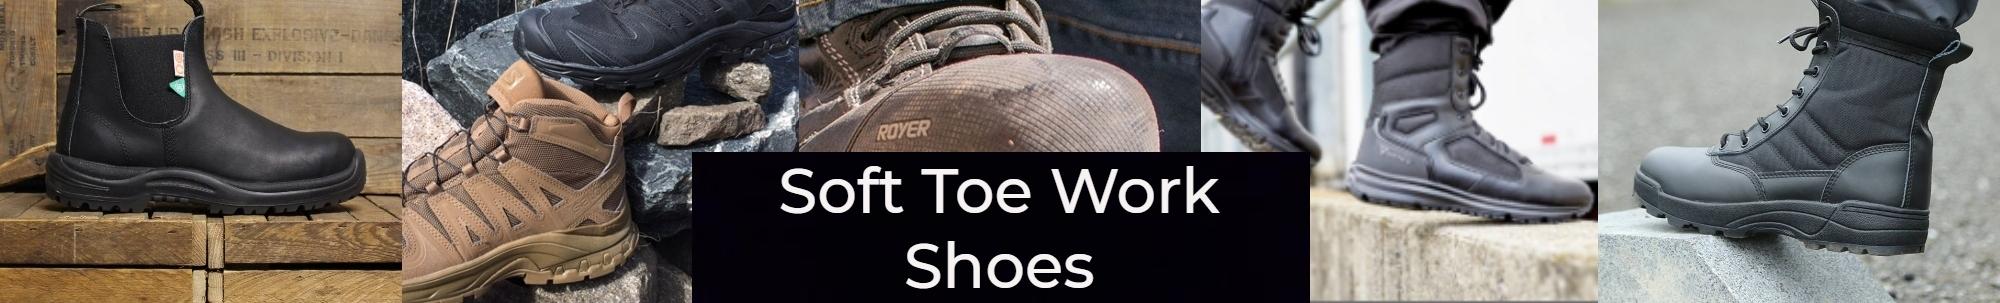 boots-softMALE182649.jpg